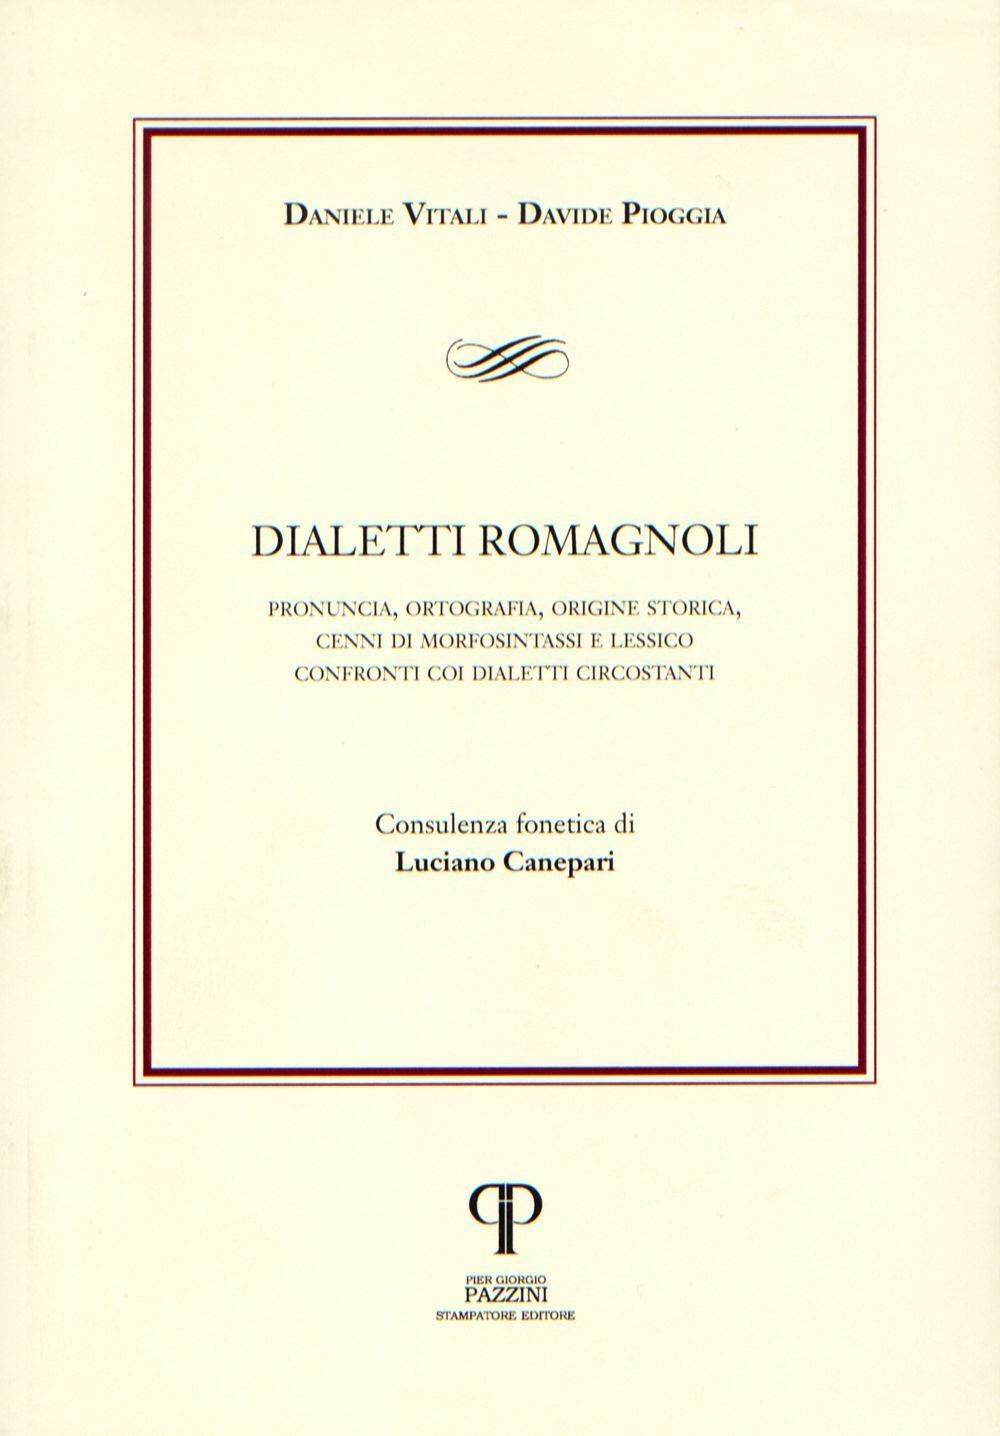 Dialetti romagnoli